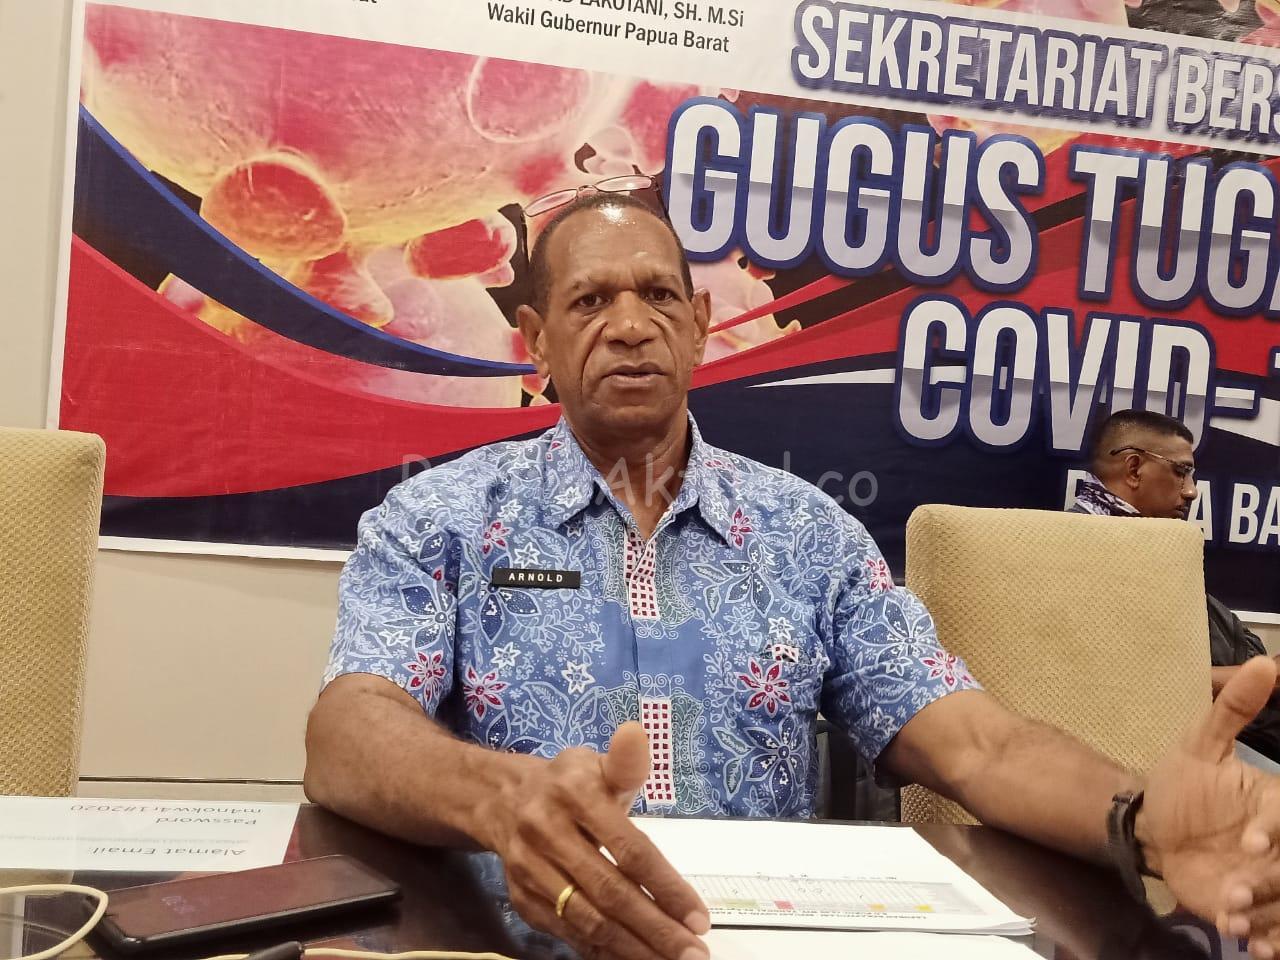 Pasien Positif Corona di Papua Barat Hari Ini 28 April Naik Dua Kali Lipat 2 IMG 20200427 WA0032